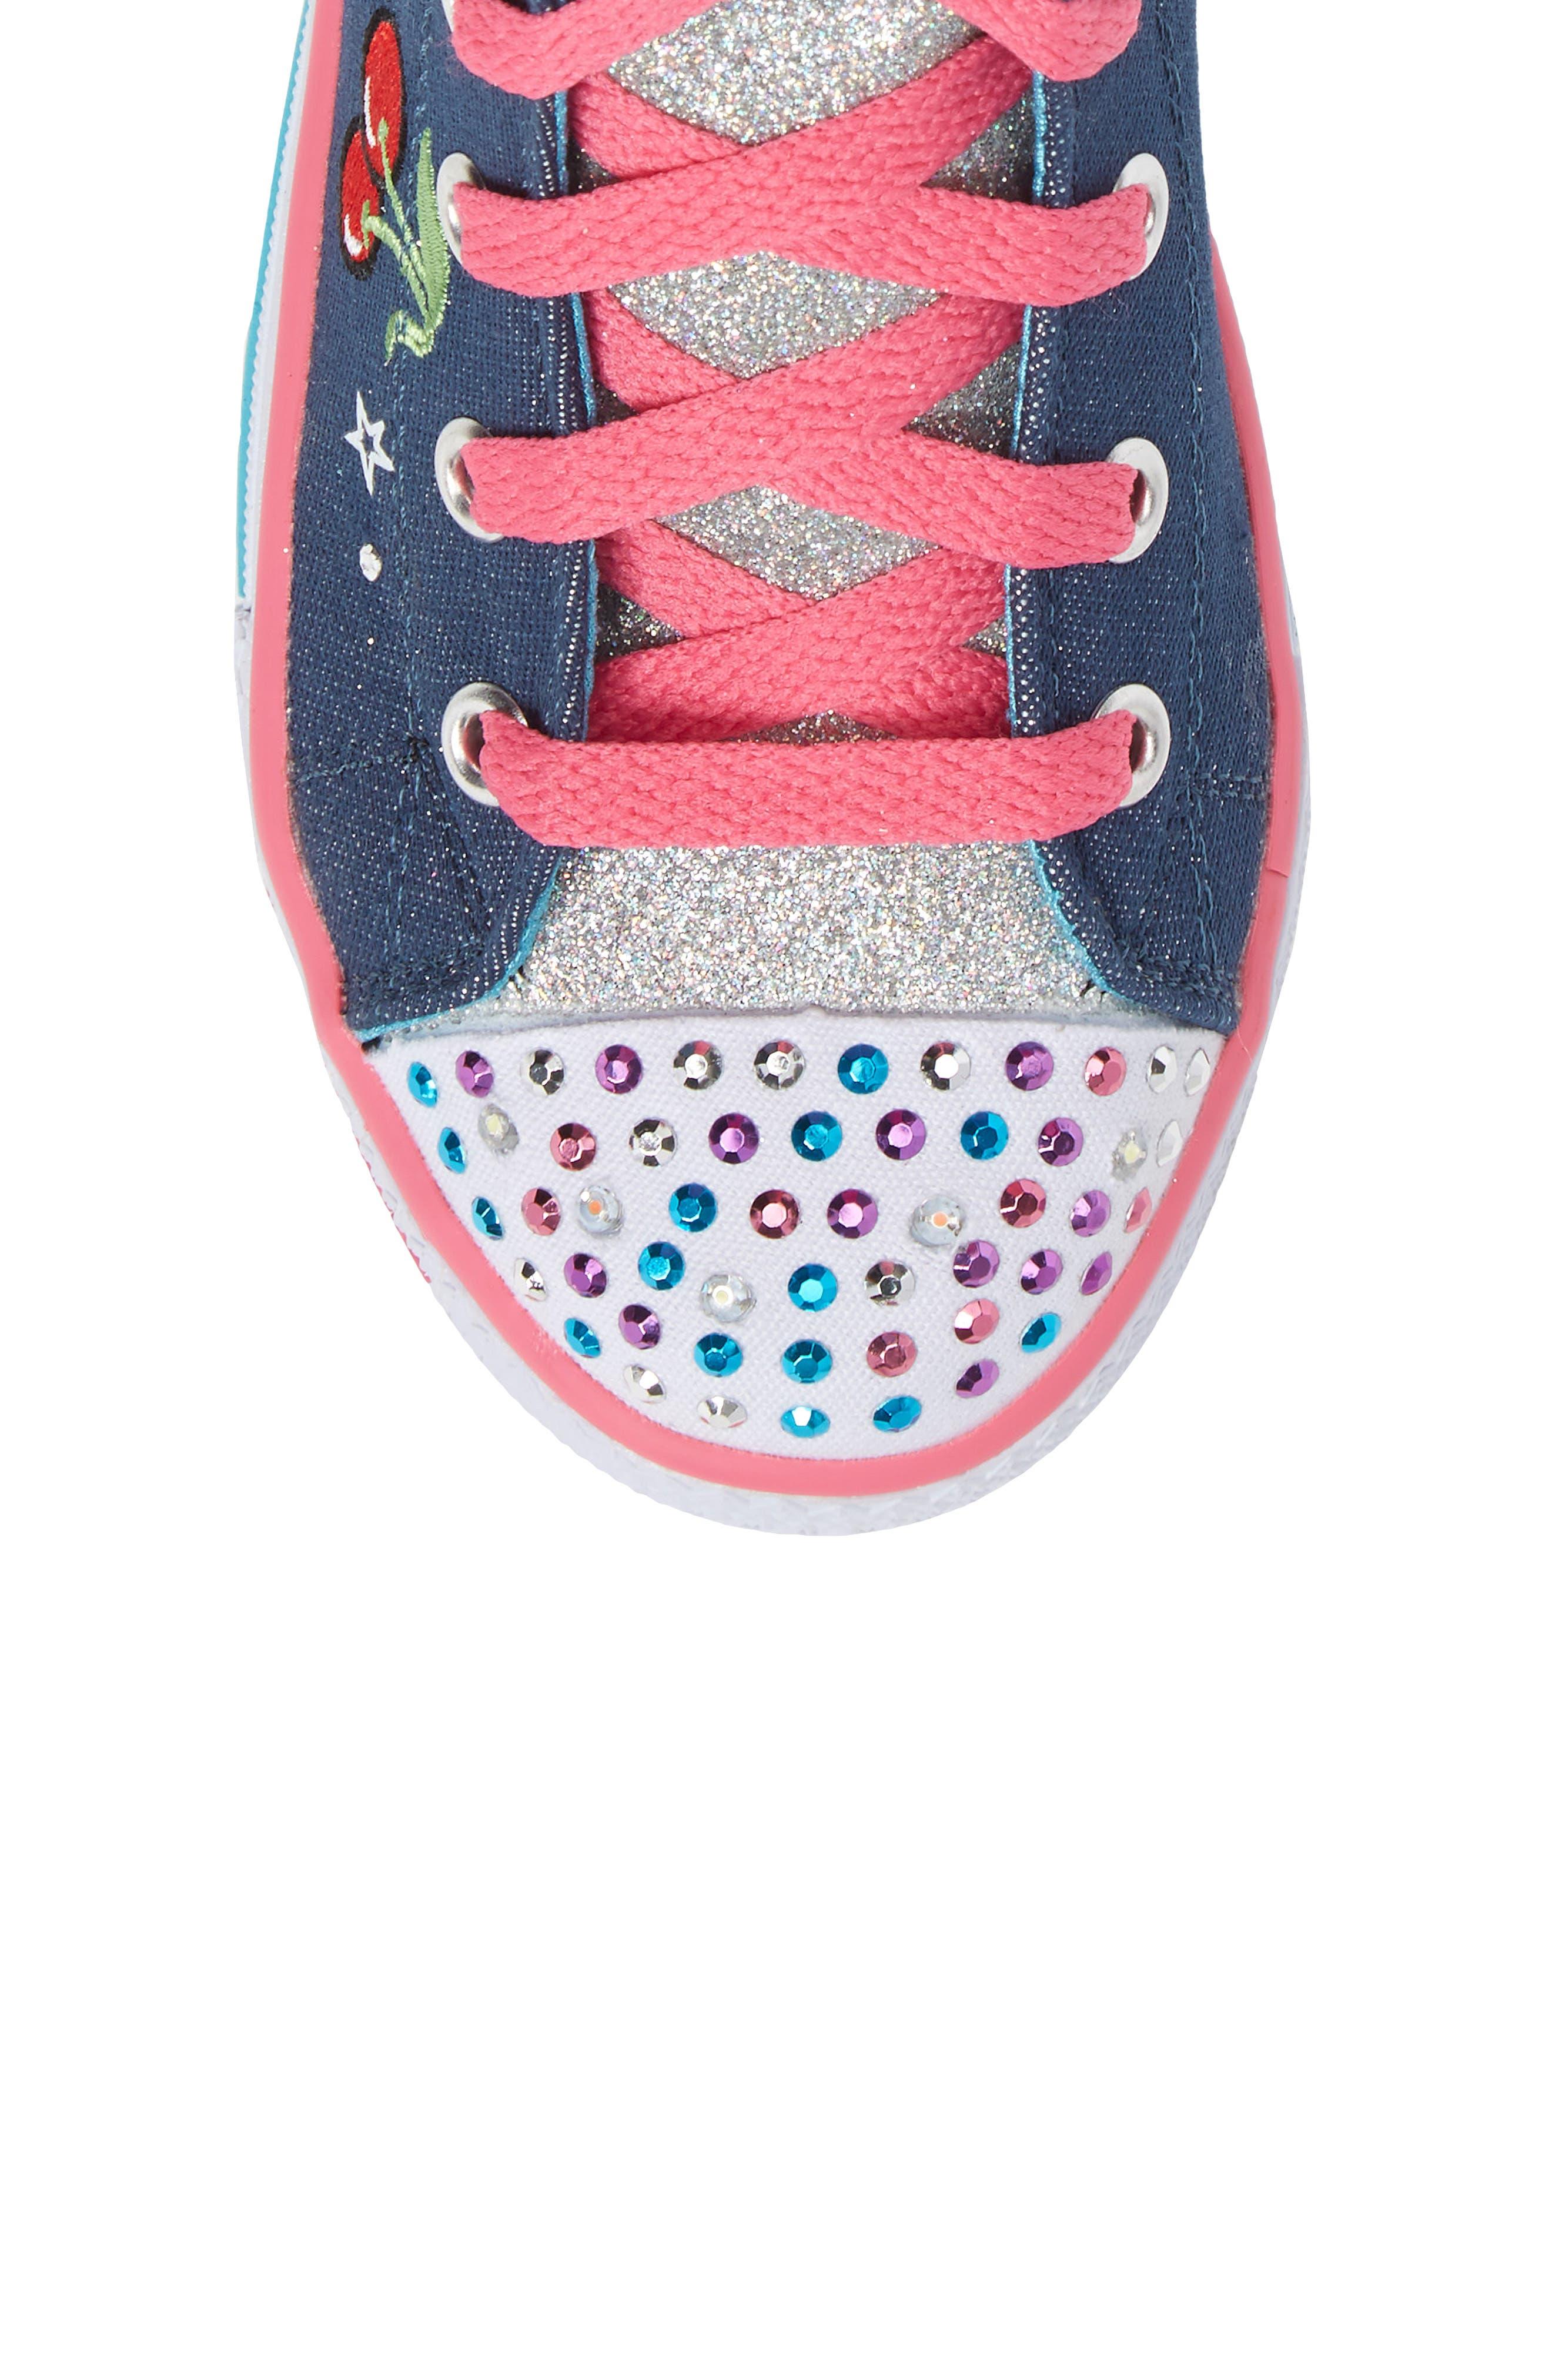 Twinkle Toes Shuffles Ultra High Top Sneaker,                             Alternate thumbnail 5, color,                             Denim/ Multi